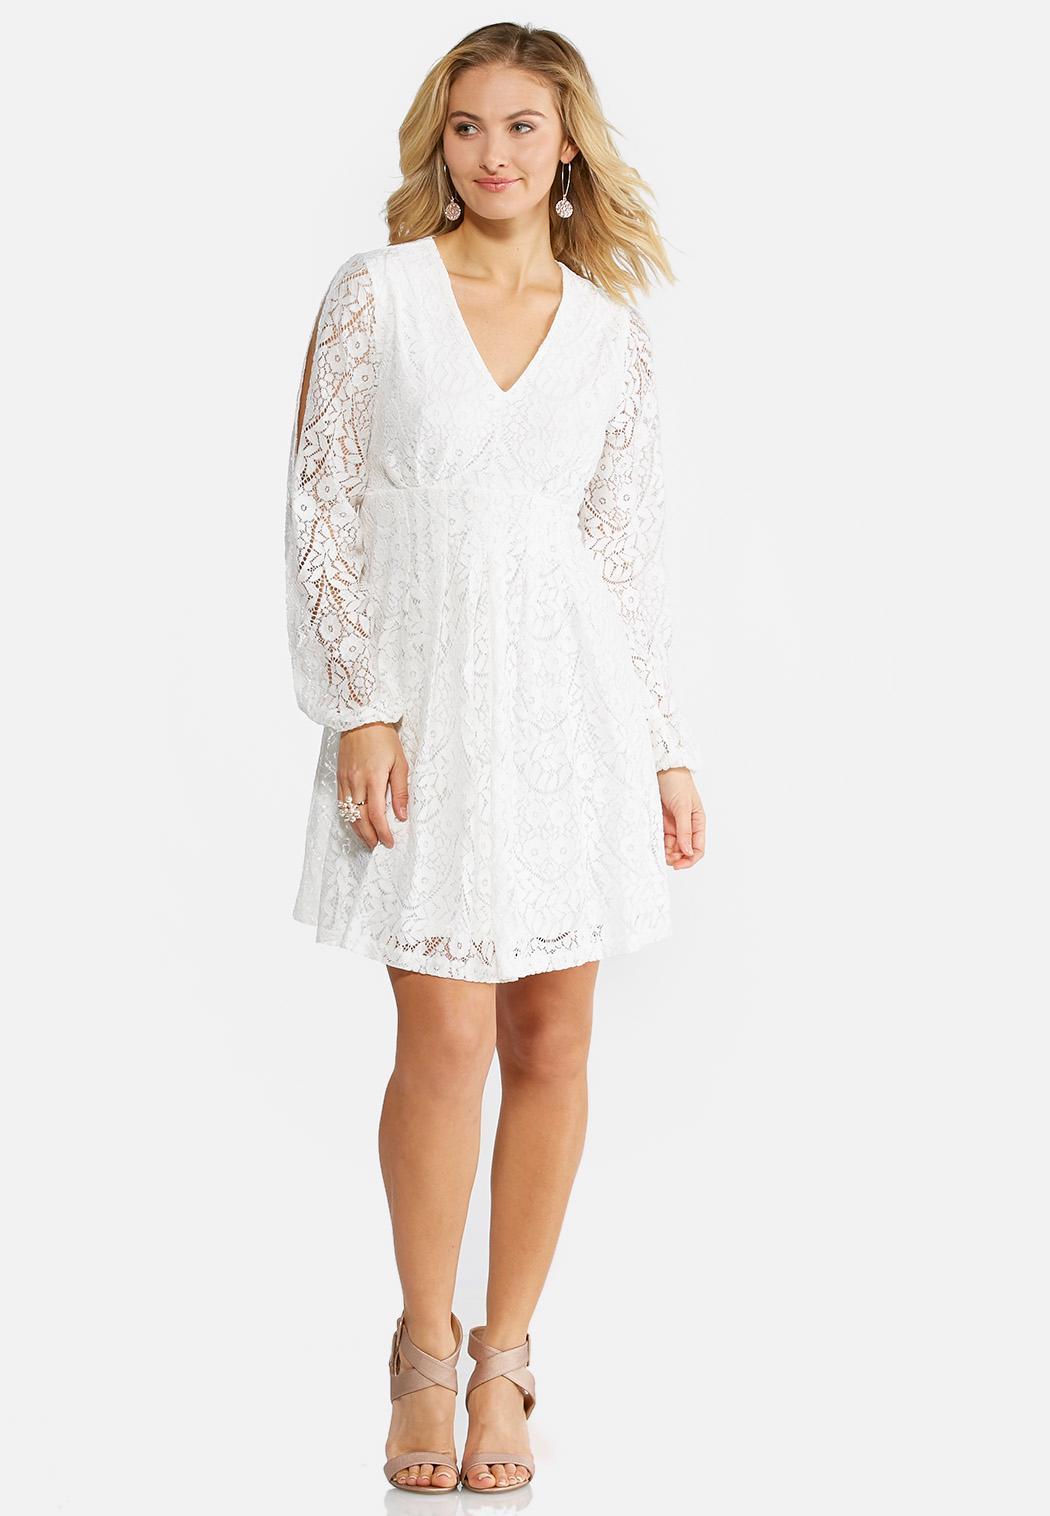 Plus Size Allover Lace Empire Swing Dress A Line Swing Cato Fashions